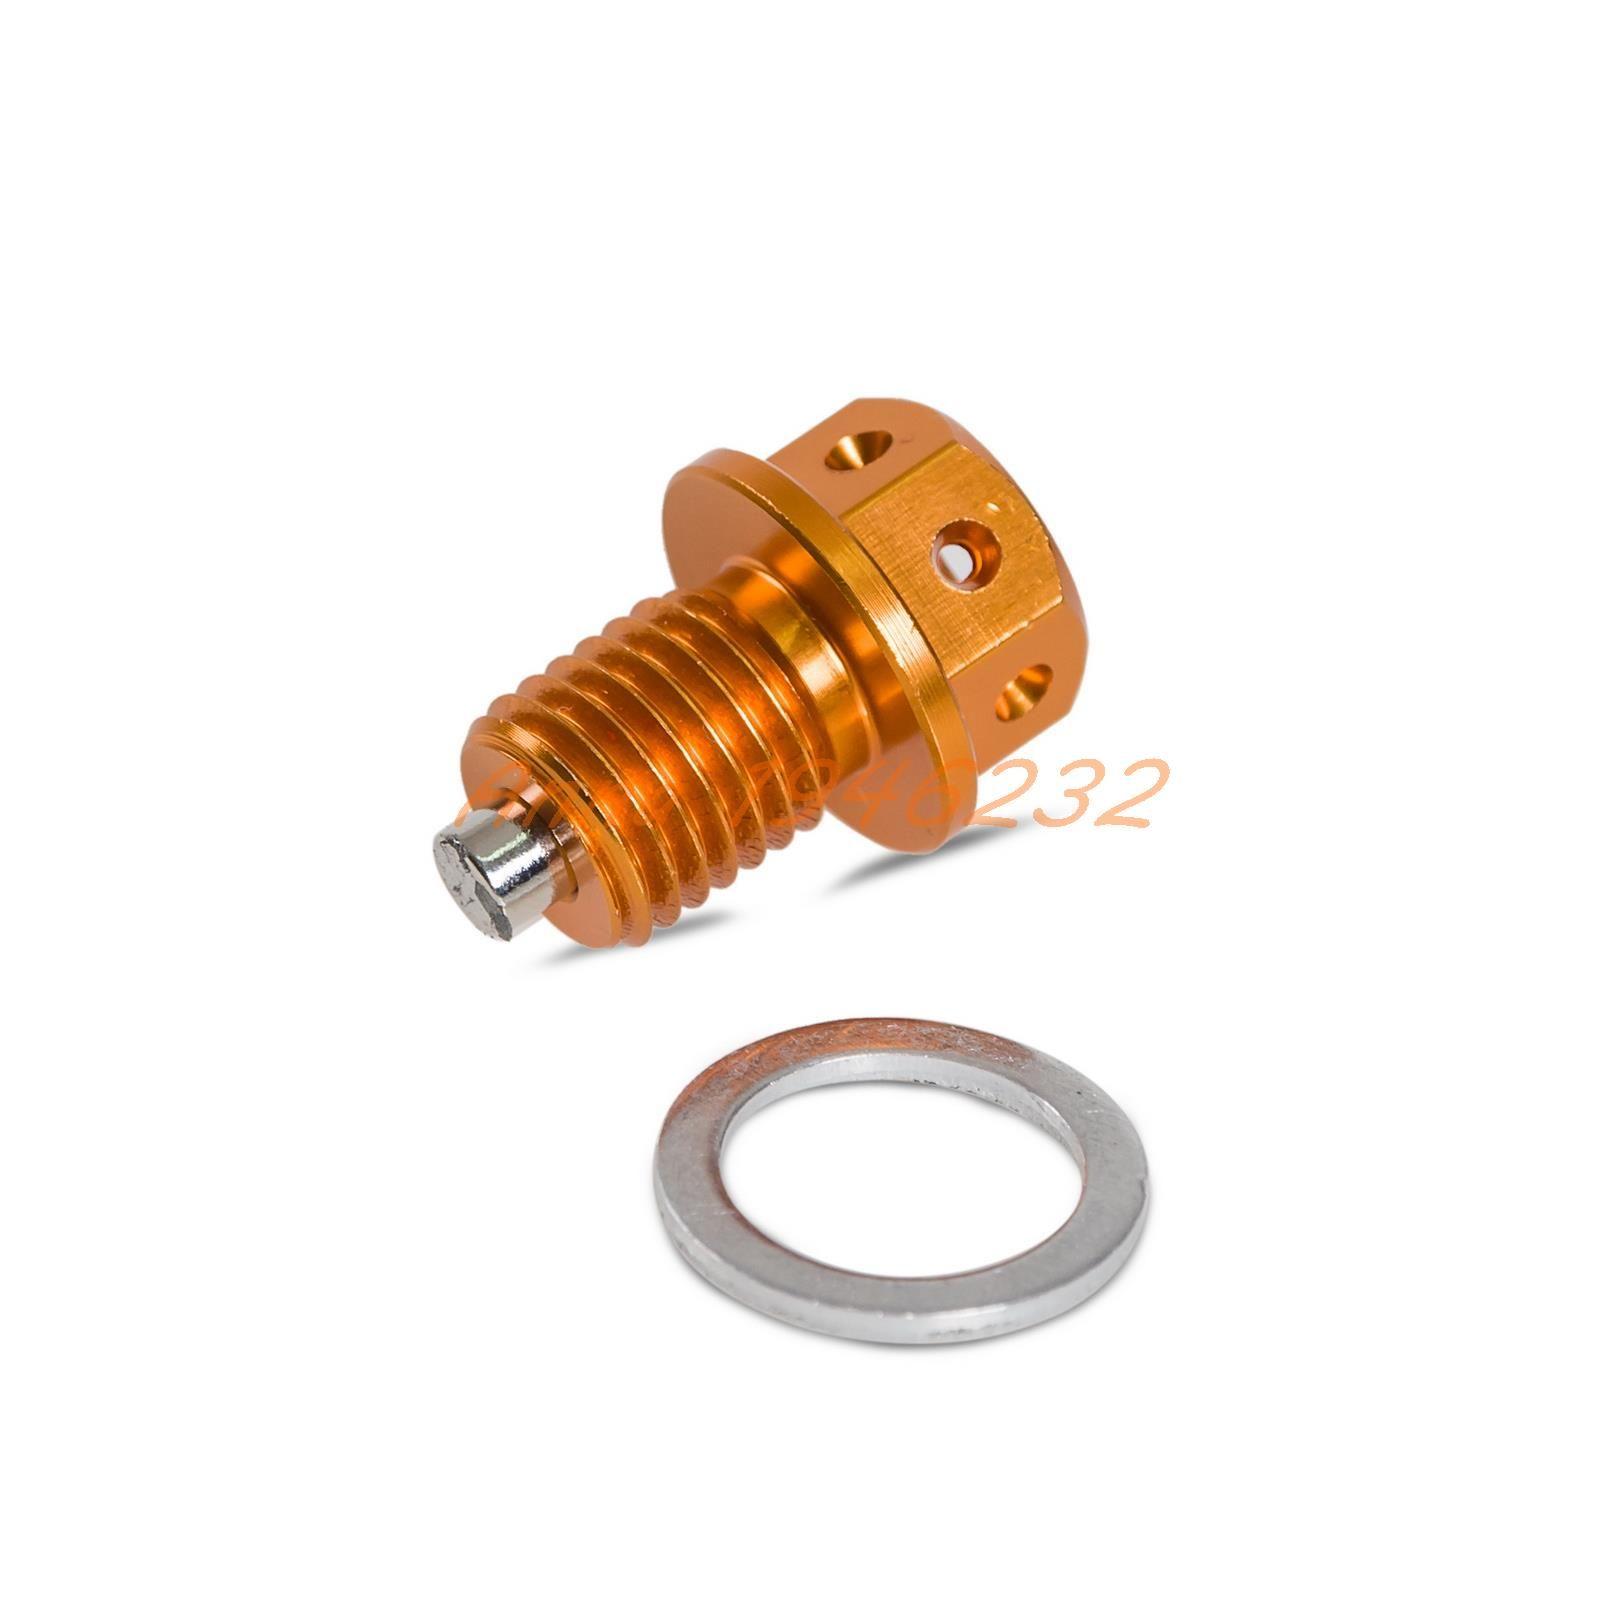 M14xP1.25 Magnetic Oil Drain Plug Bolt For Suzuki GSX-R600 R750 R1000 1300R Hayabusa VL1500 Inazuma 250 400 1200